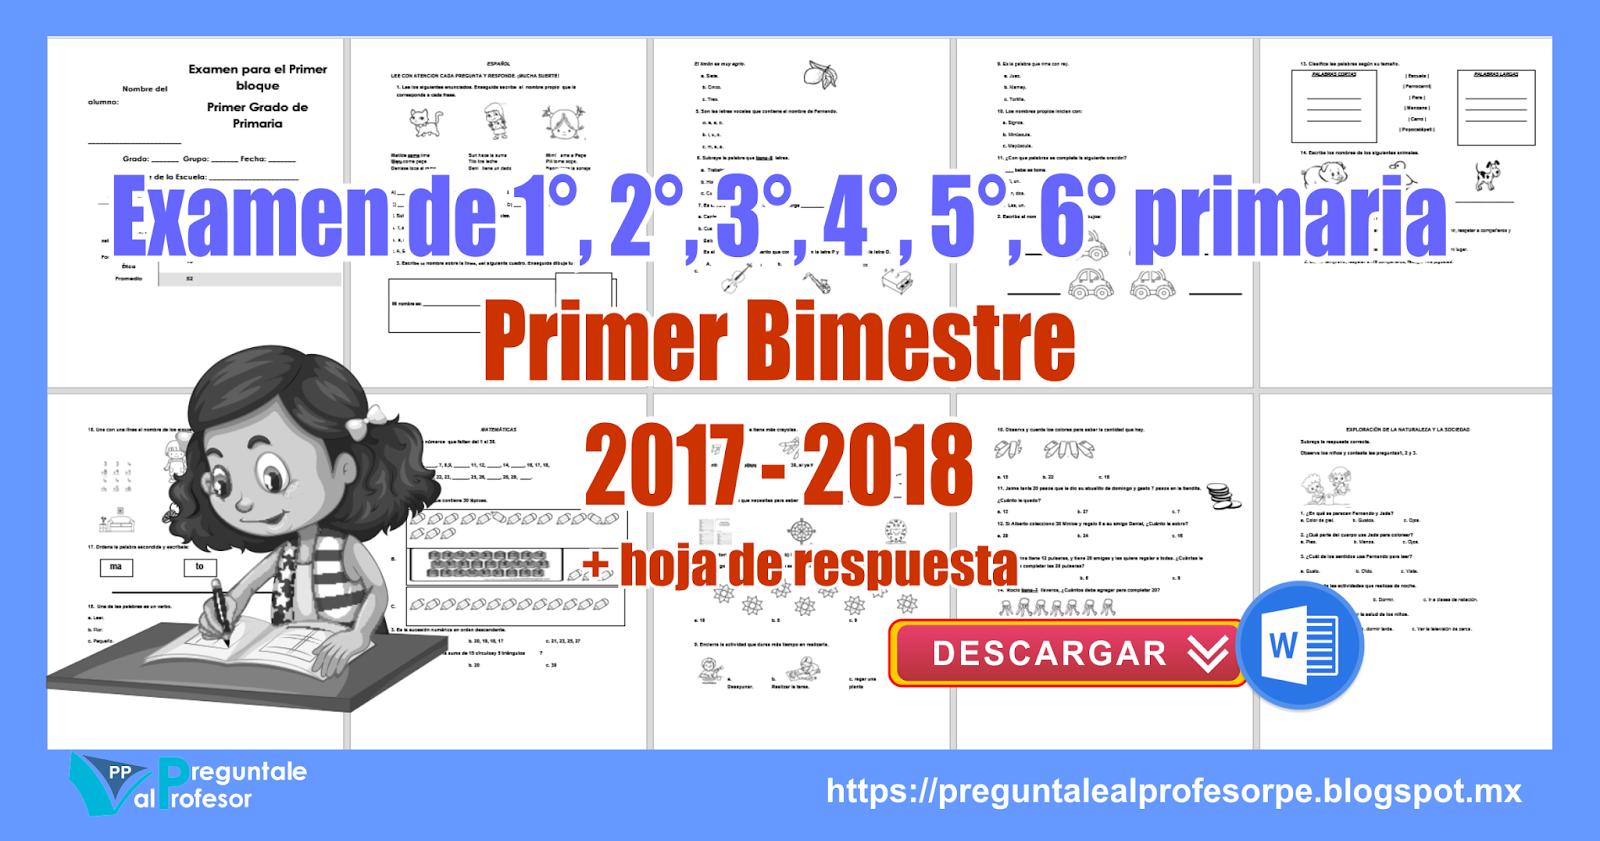 Examen de 1°, 2°, 3°, 4°, 5°, 6° grado Primer Bimestre 2017 - 2018 + ...